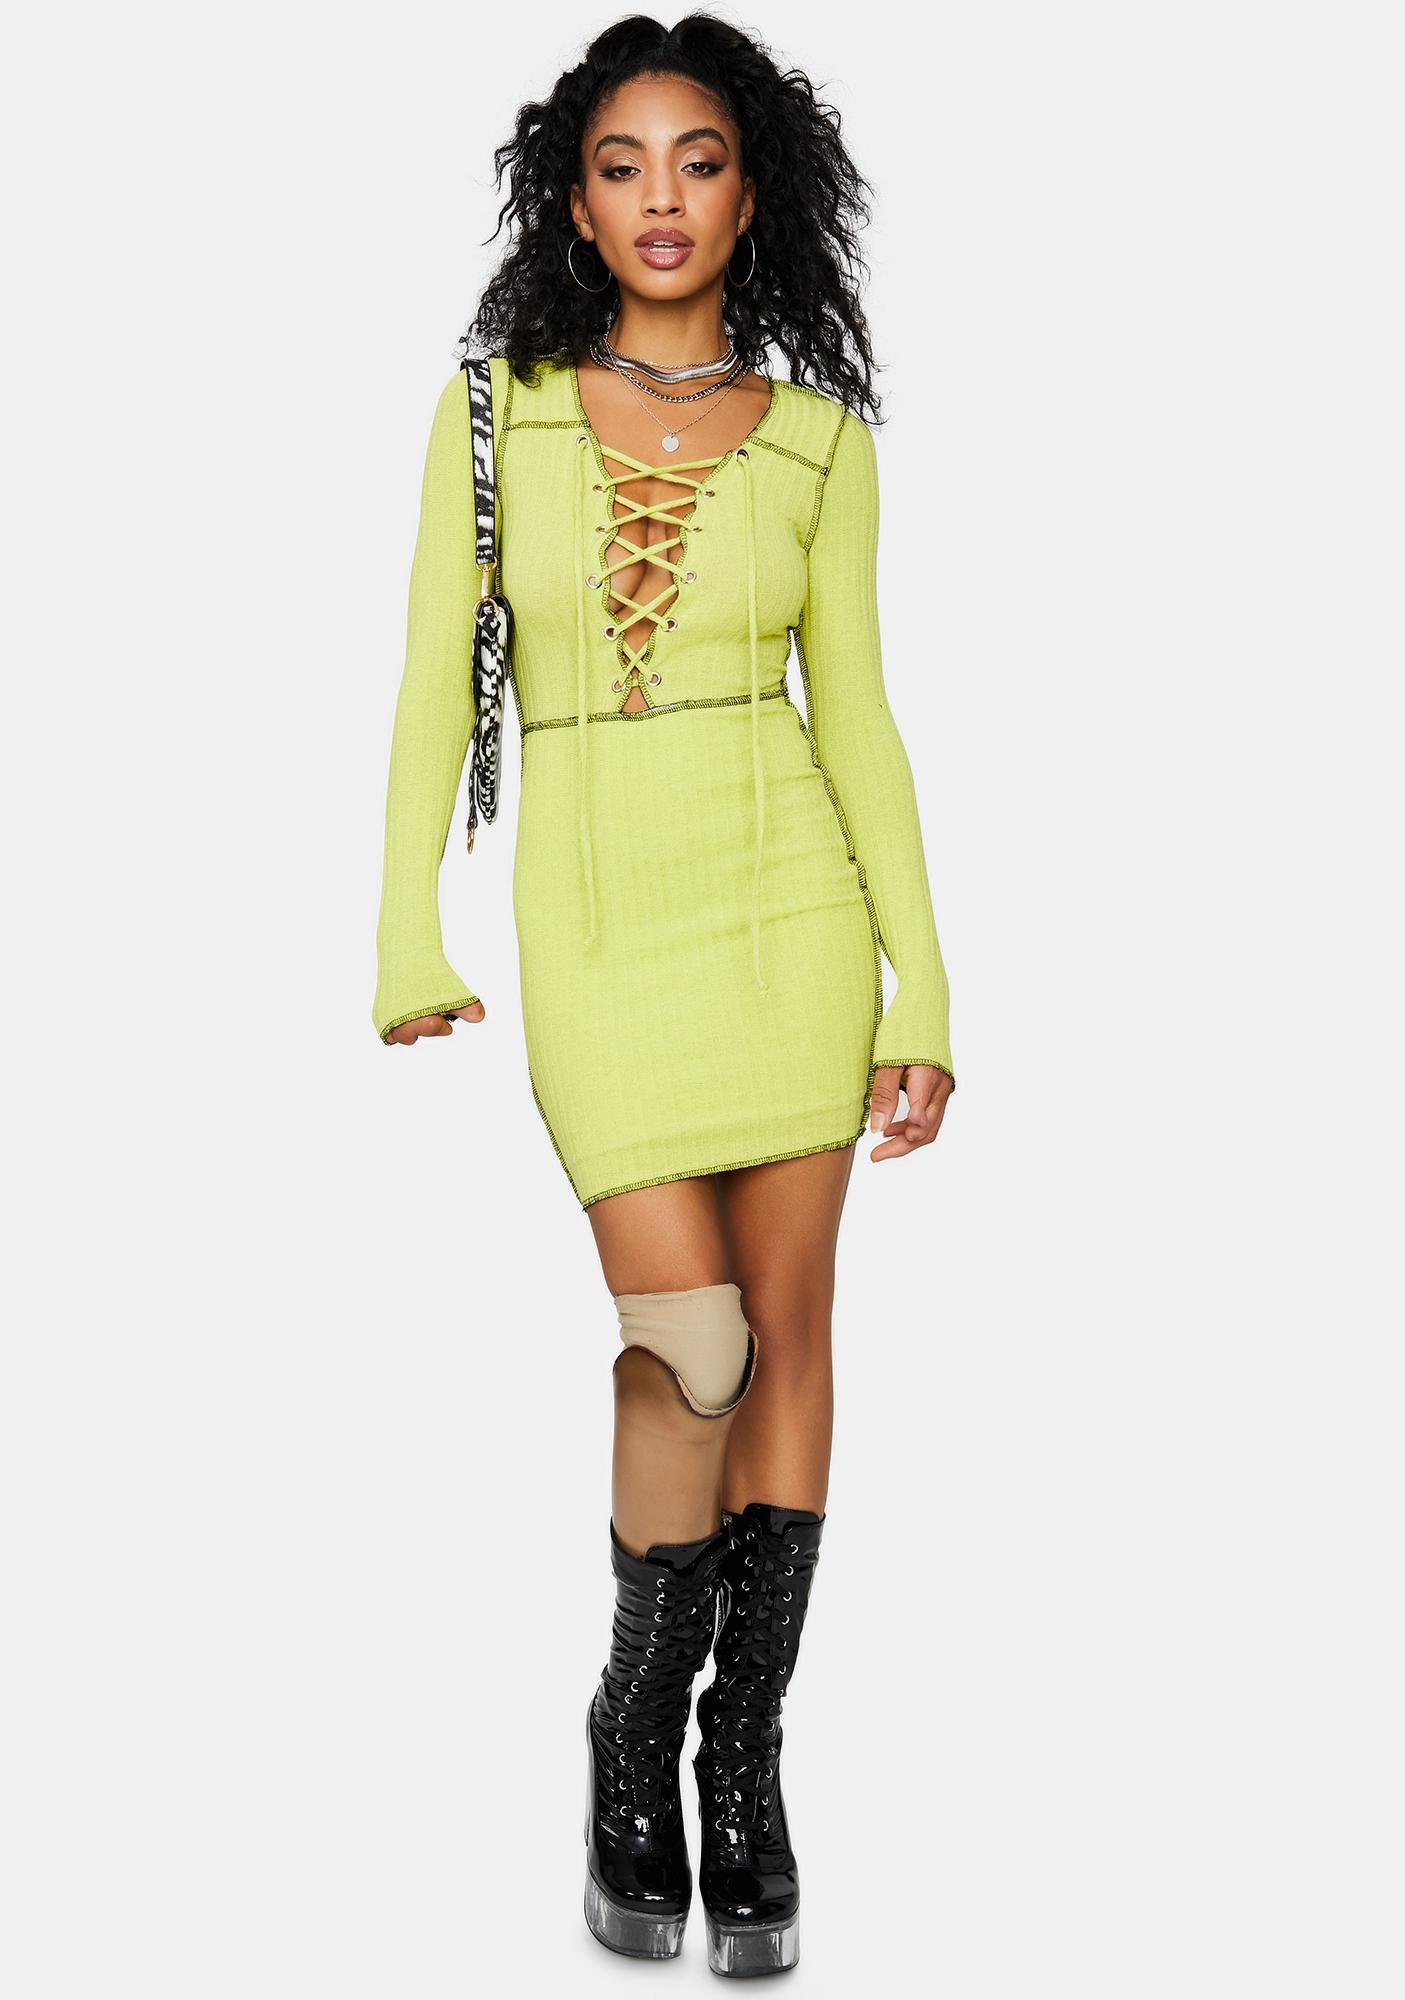 Catch Me Slippin' Lace Up Mini Dress